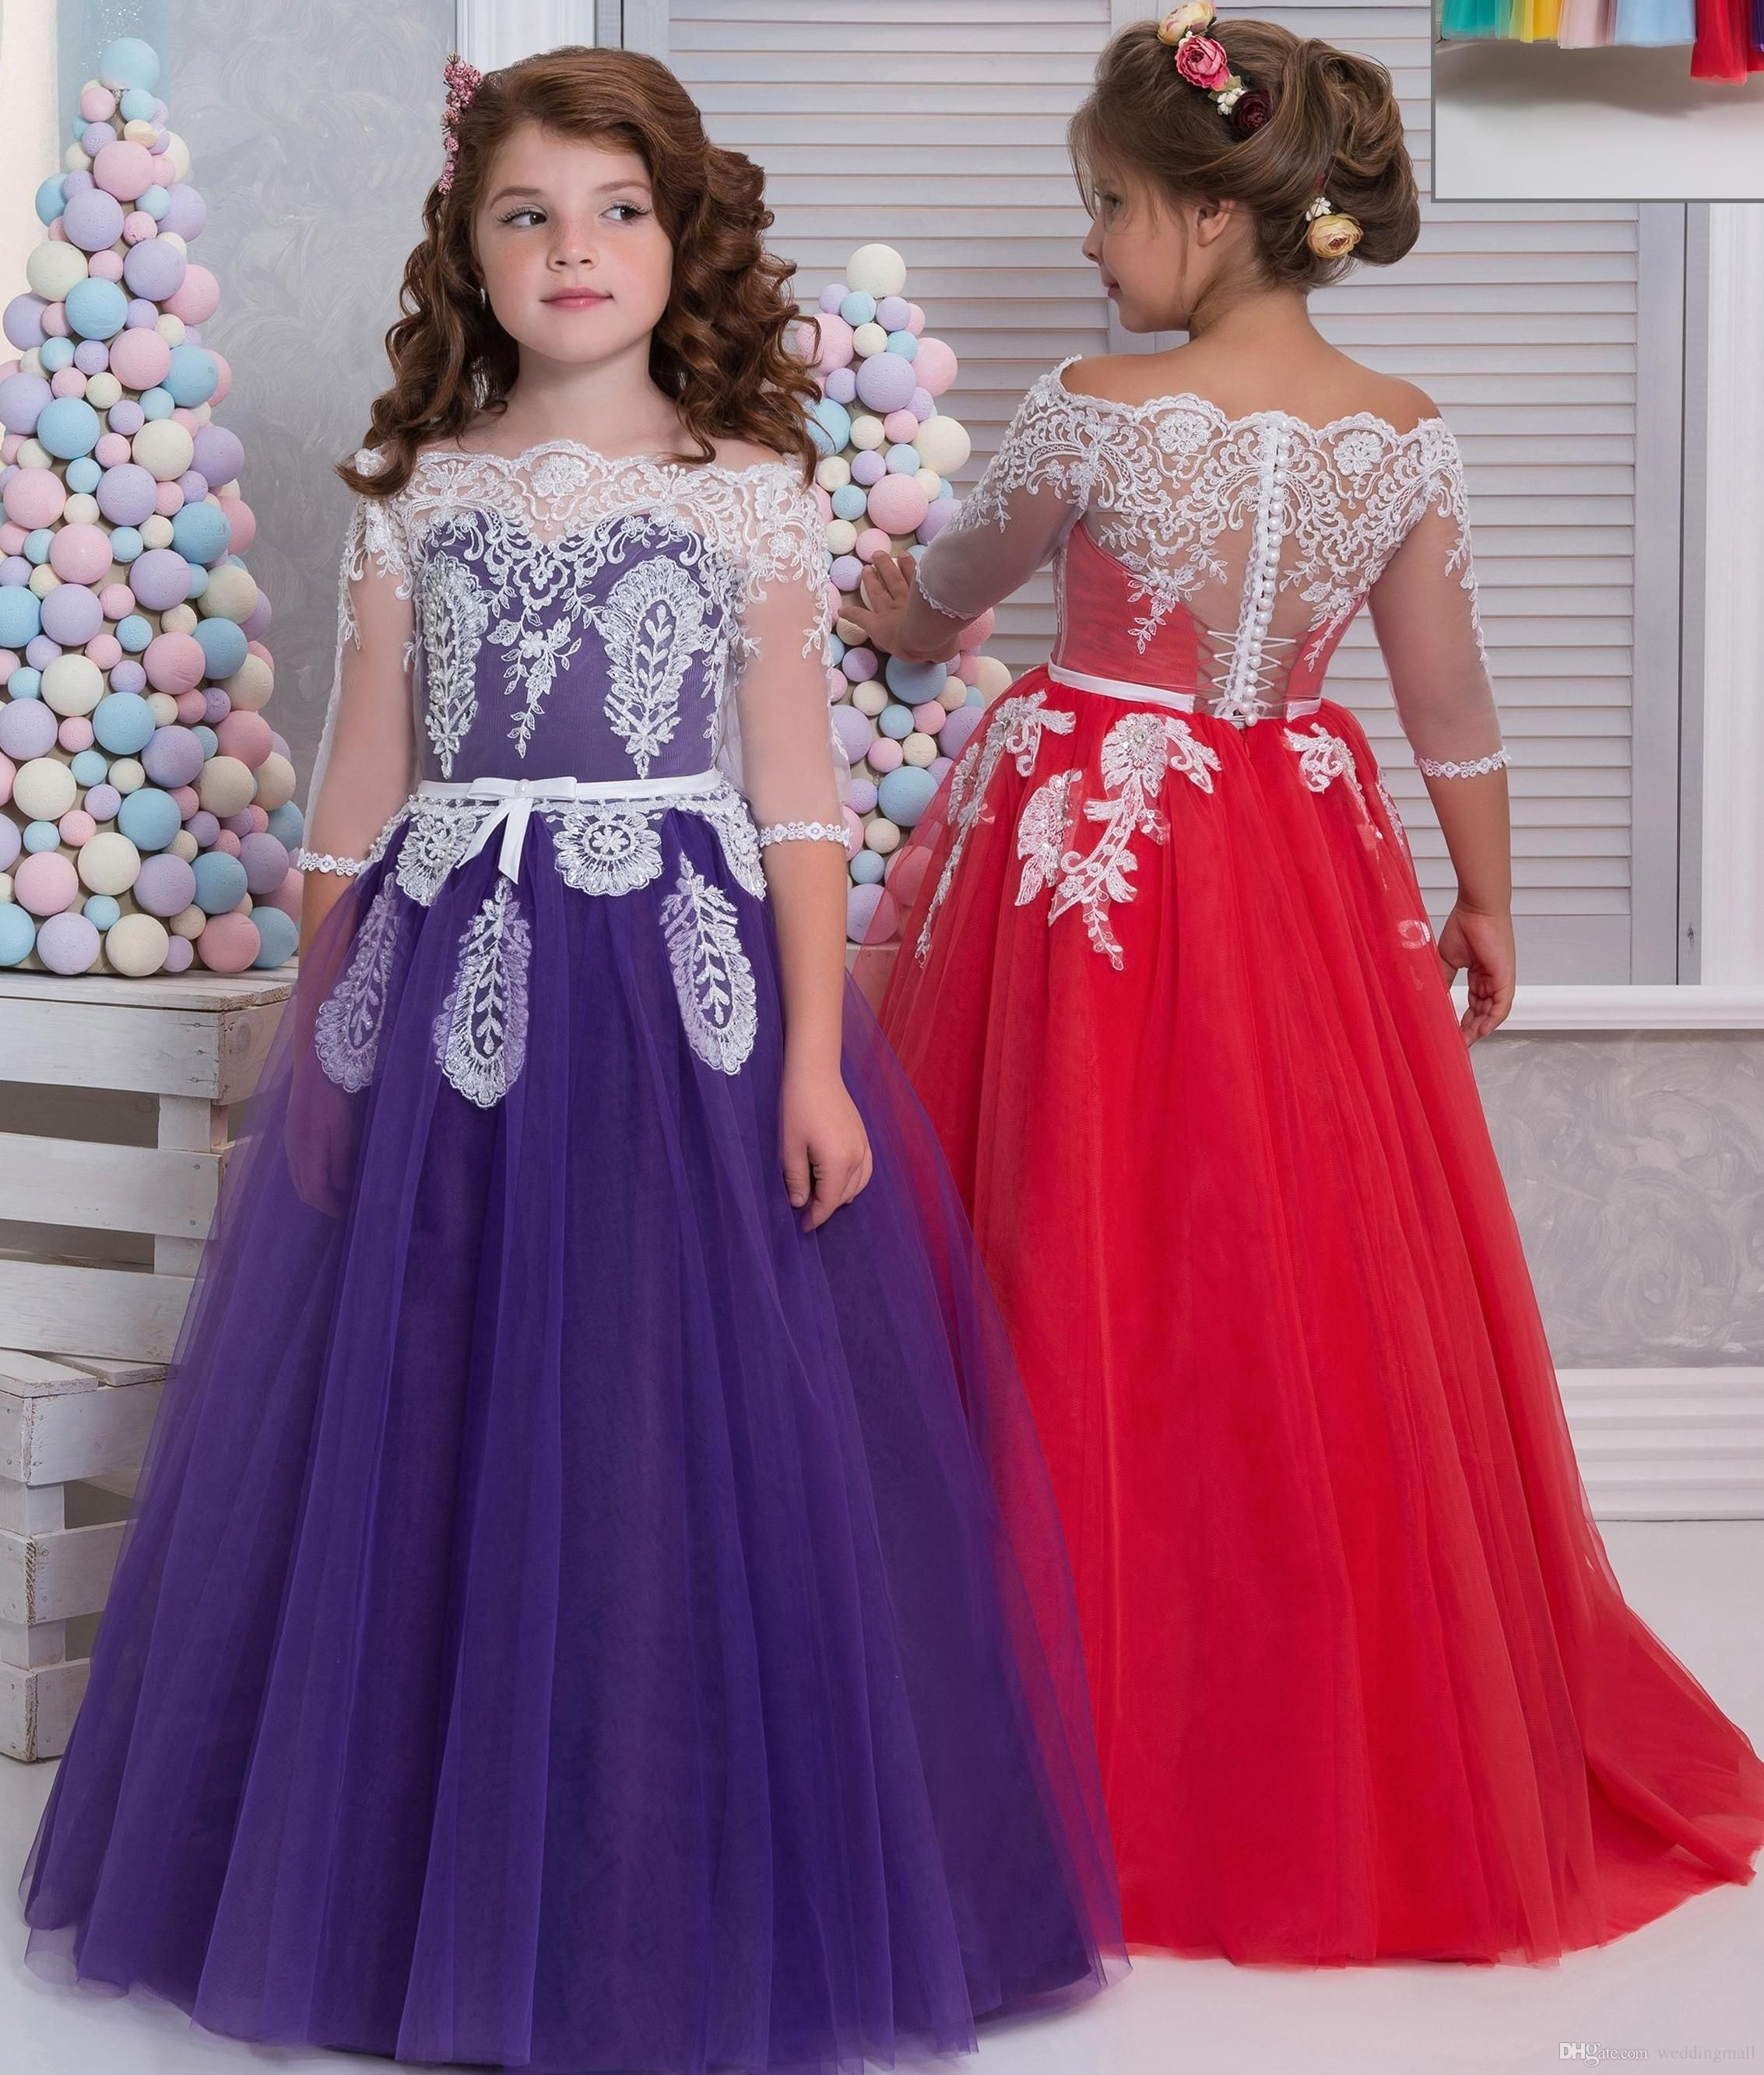 660ae4170e3 Cheap Lace Arabic 2017 Flower Girl Dresses A Line Vintage Child ...